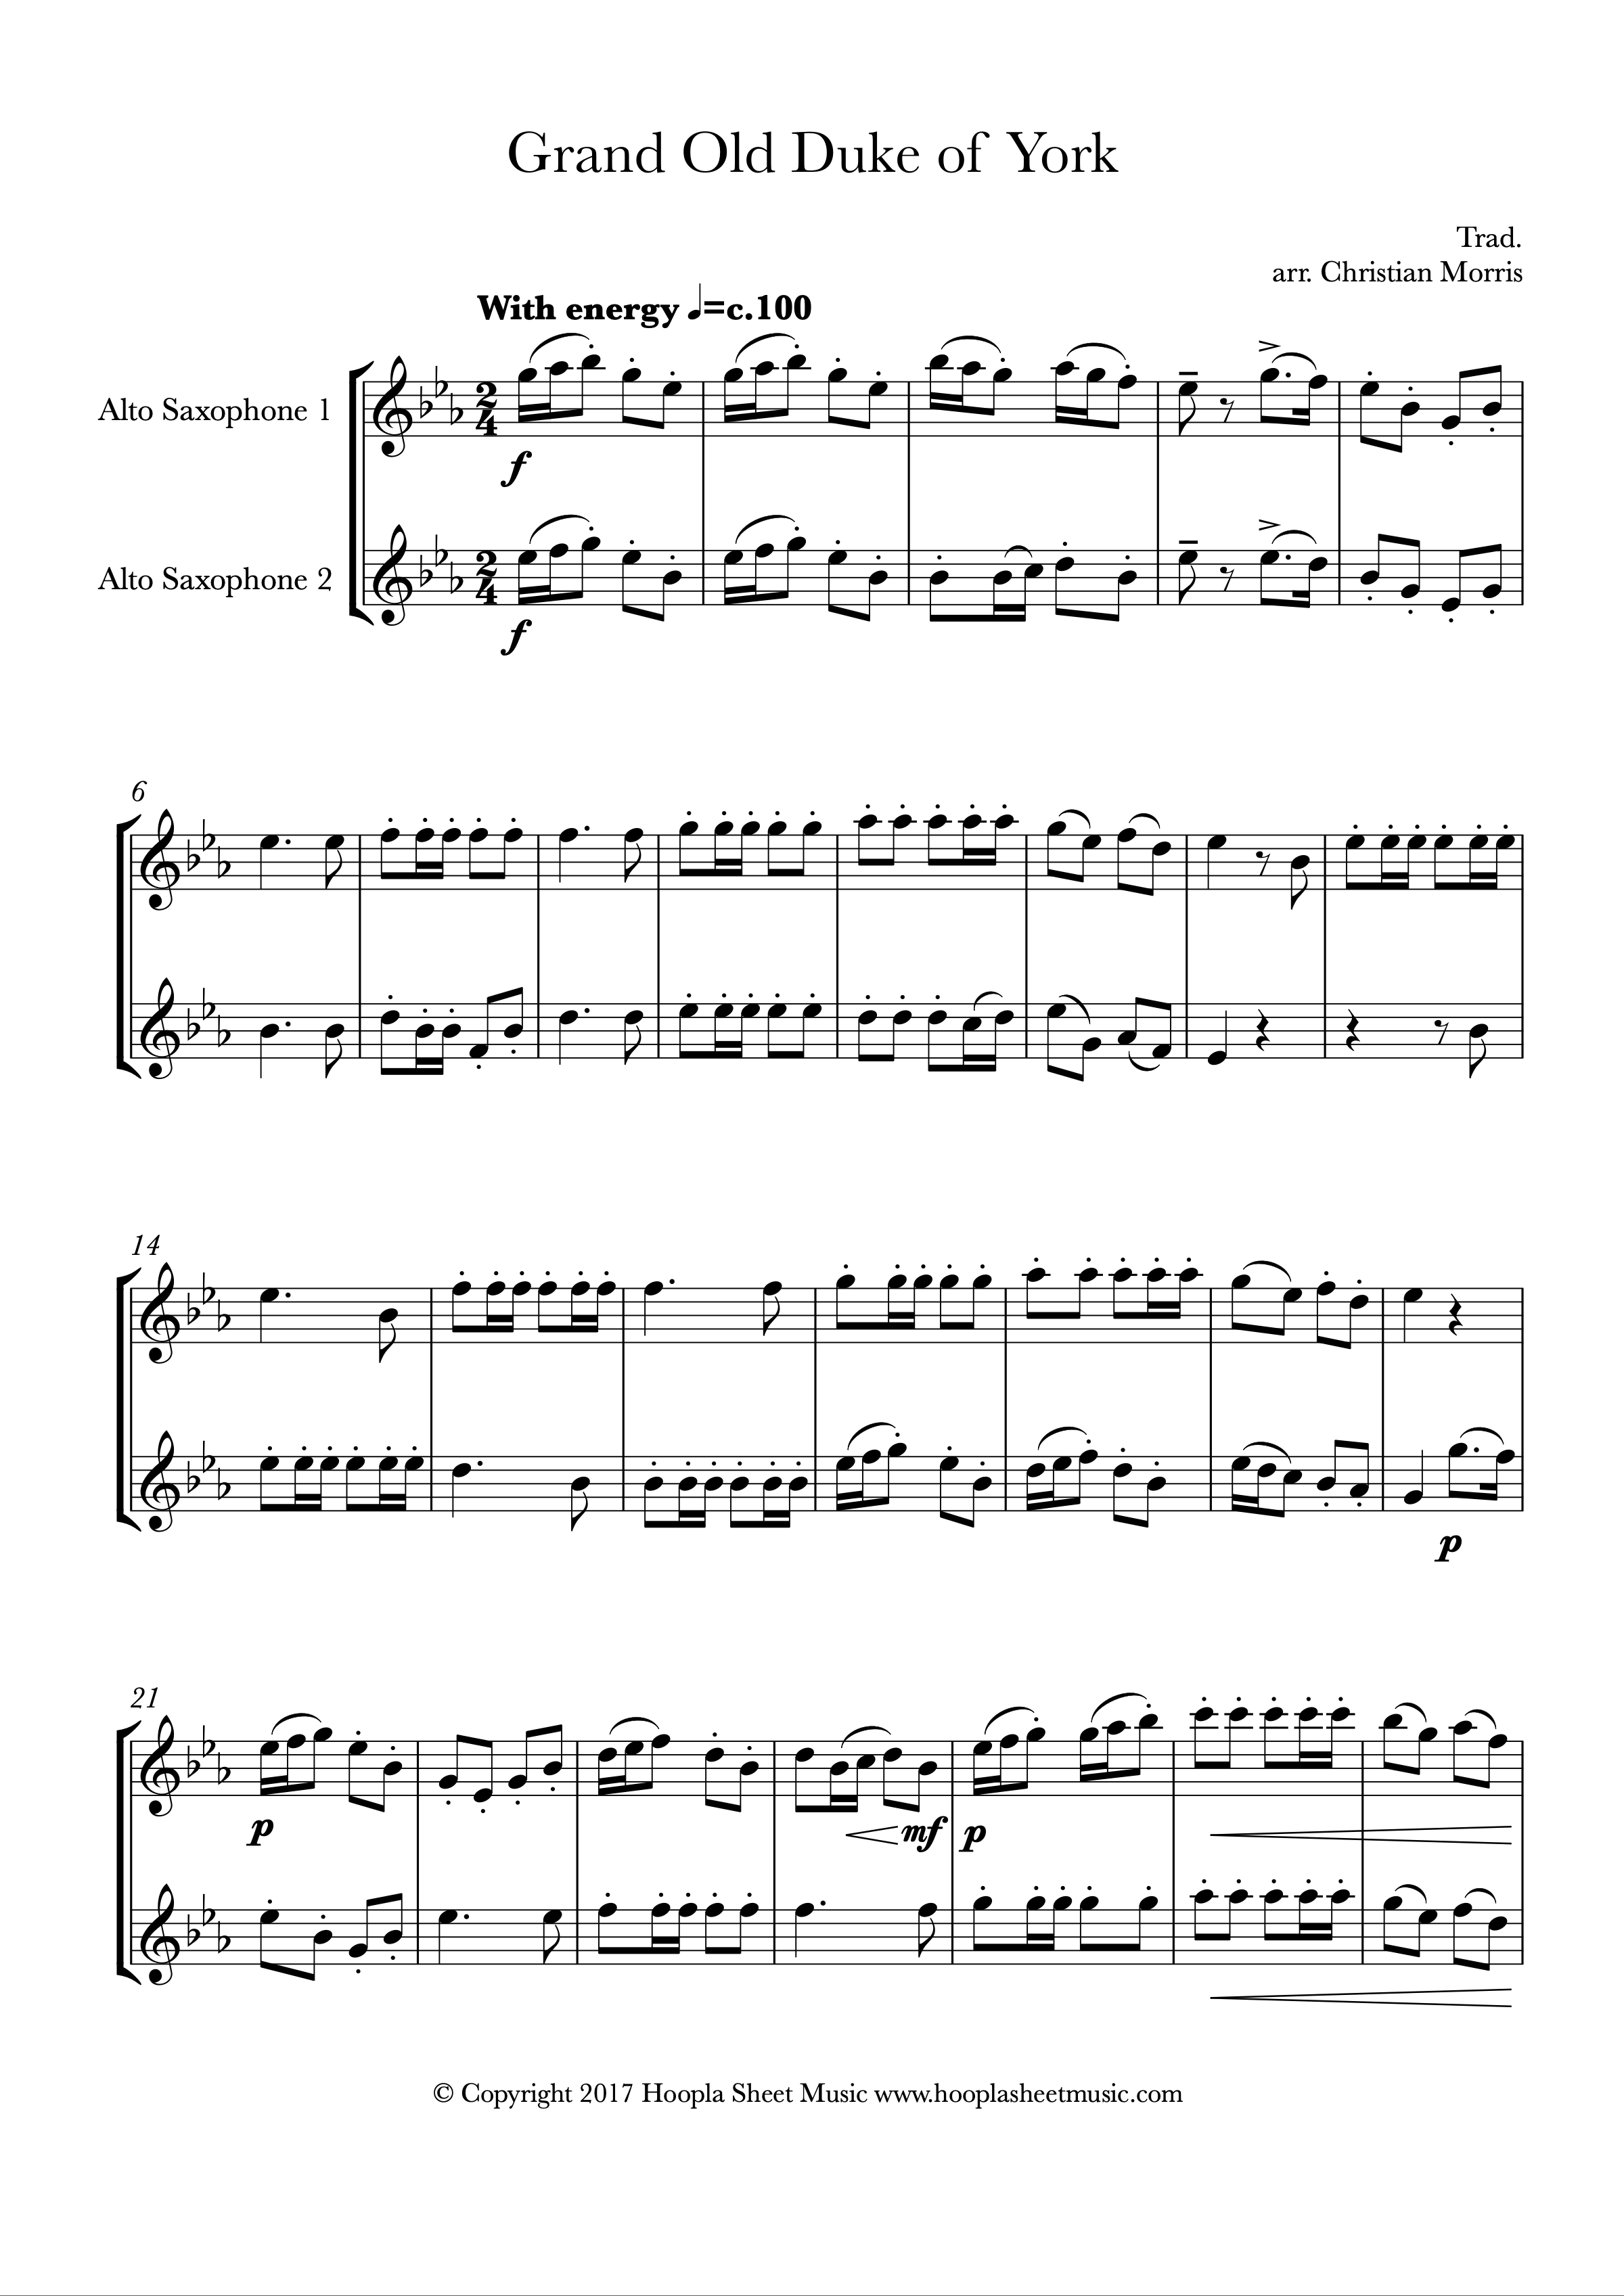 The Grand Old Duke of York (Alto Saxophone Duet)